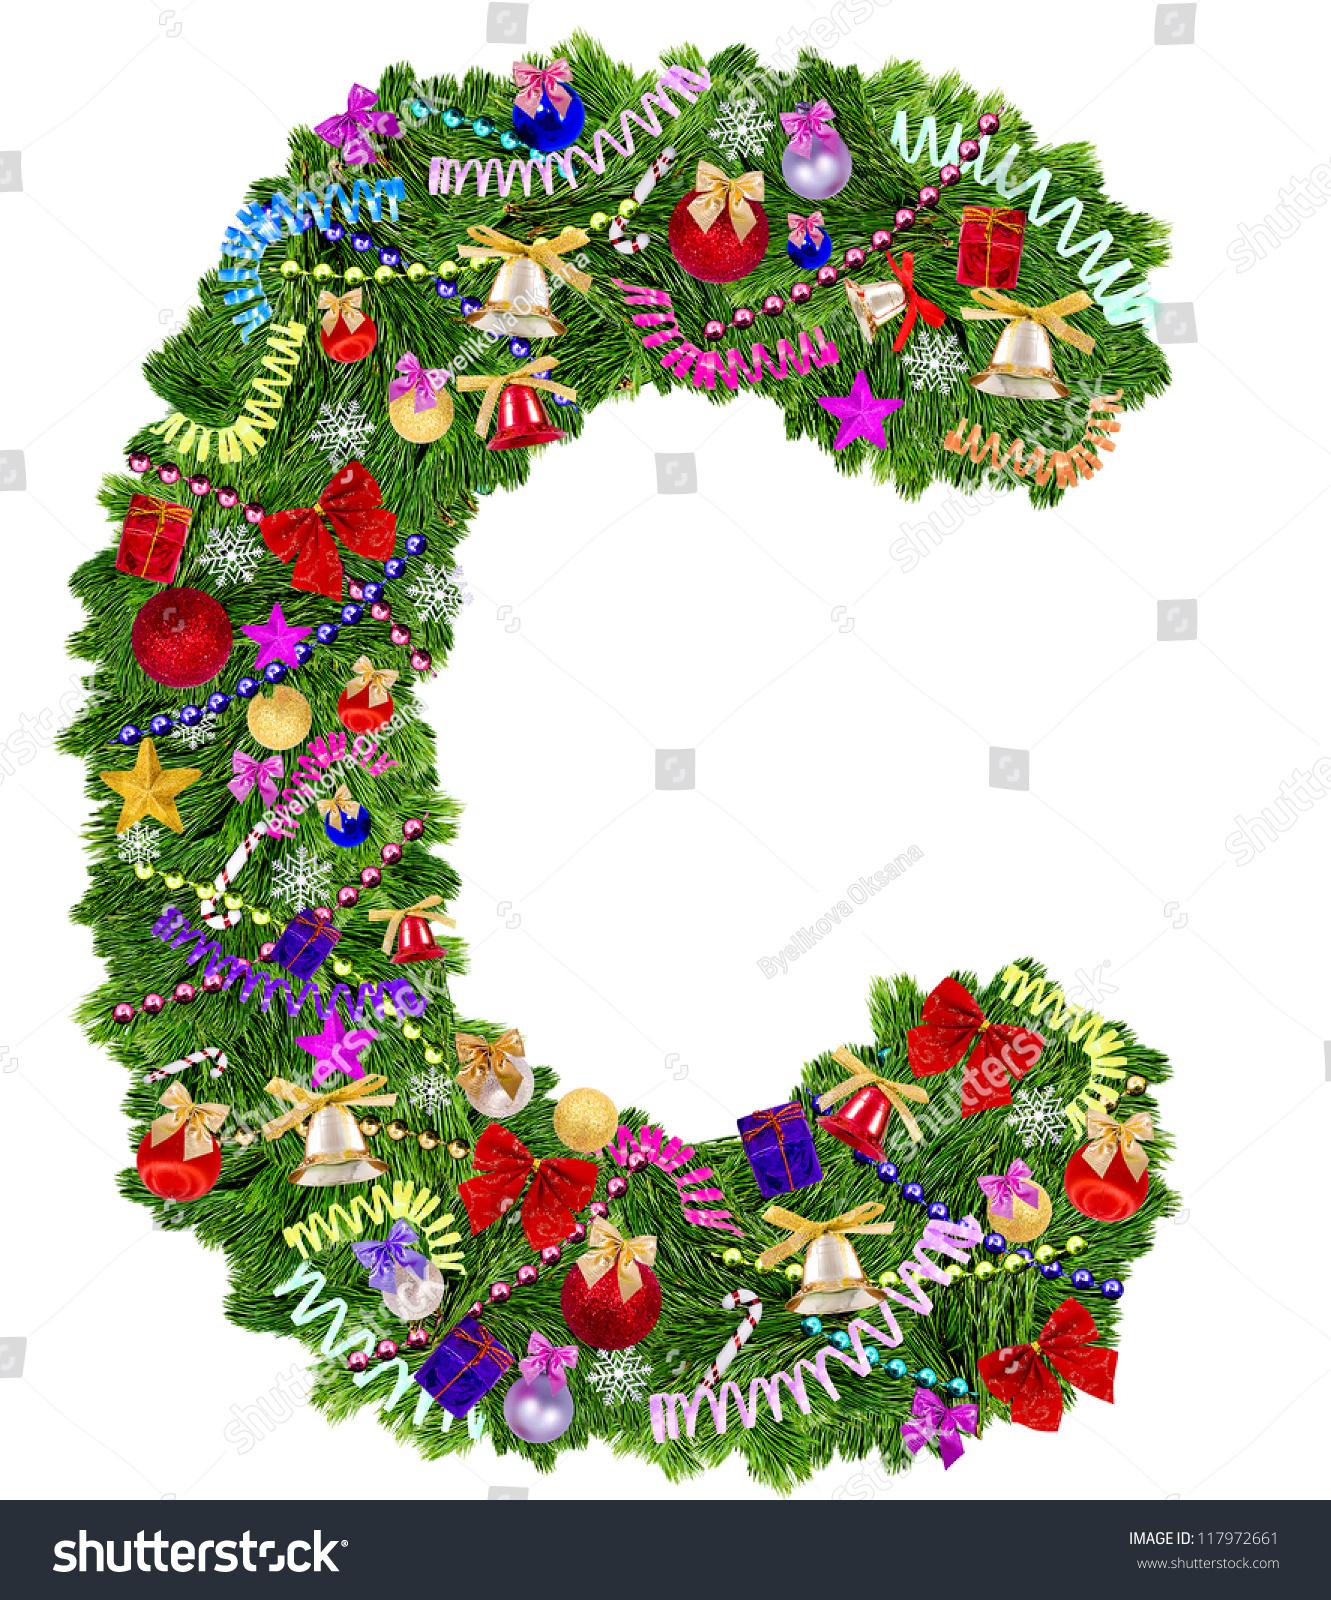 Letter C Christmas Tree Decoration On Stock Photo